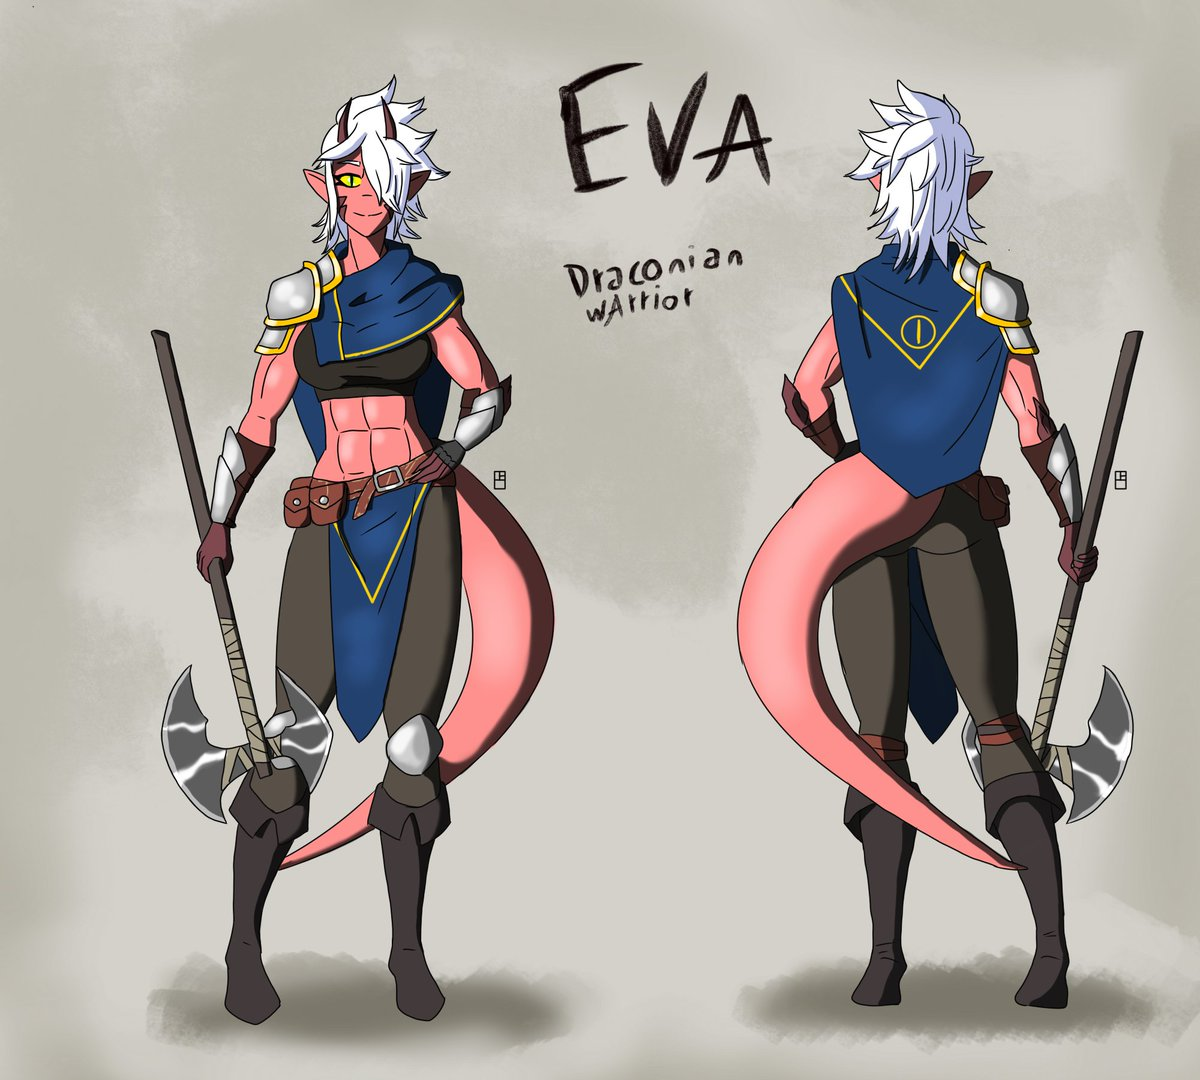 Made Eva RPG version  #drawing #digitaldrawing #digitalart #art #brasil #arte #desenho #digital #artedigital #desenhodigital #concept #characterdesign #character_design #characterart #girl #knight #rpg #medieval #characterdesign #dragon #dragongirl #originalcharacter